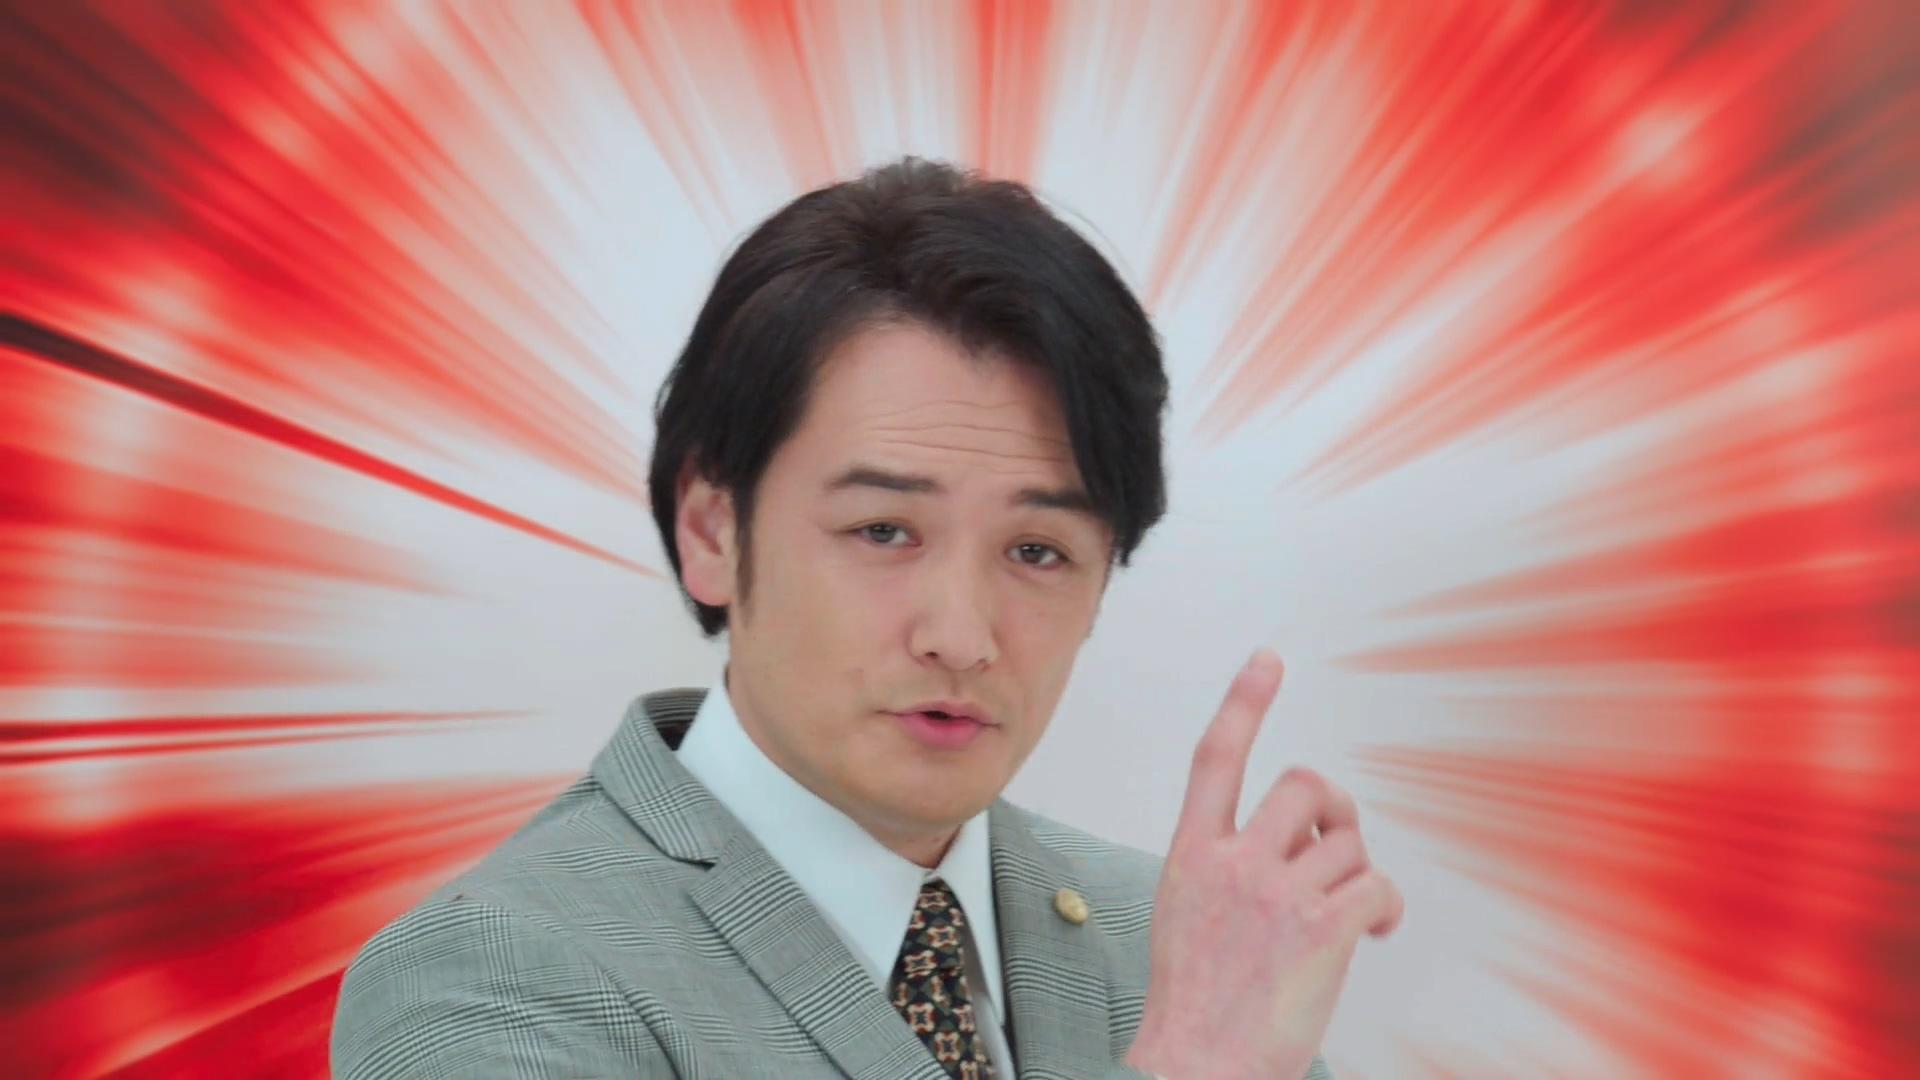 Shuichi Kitaoka